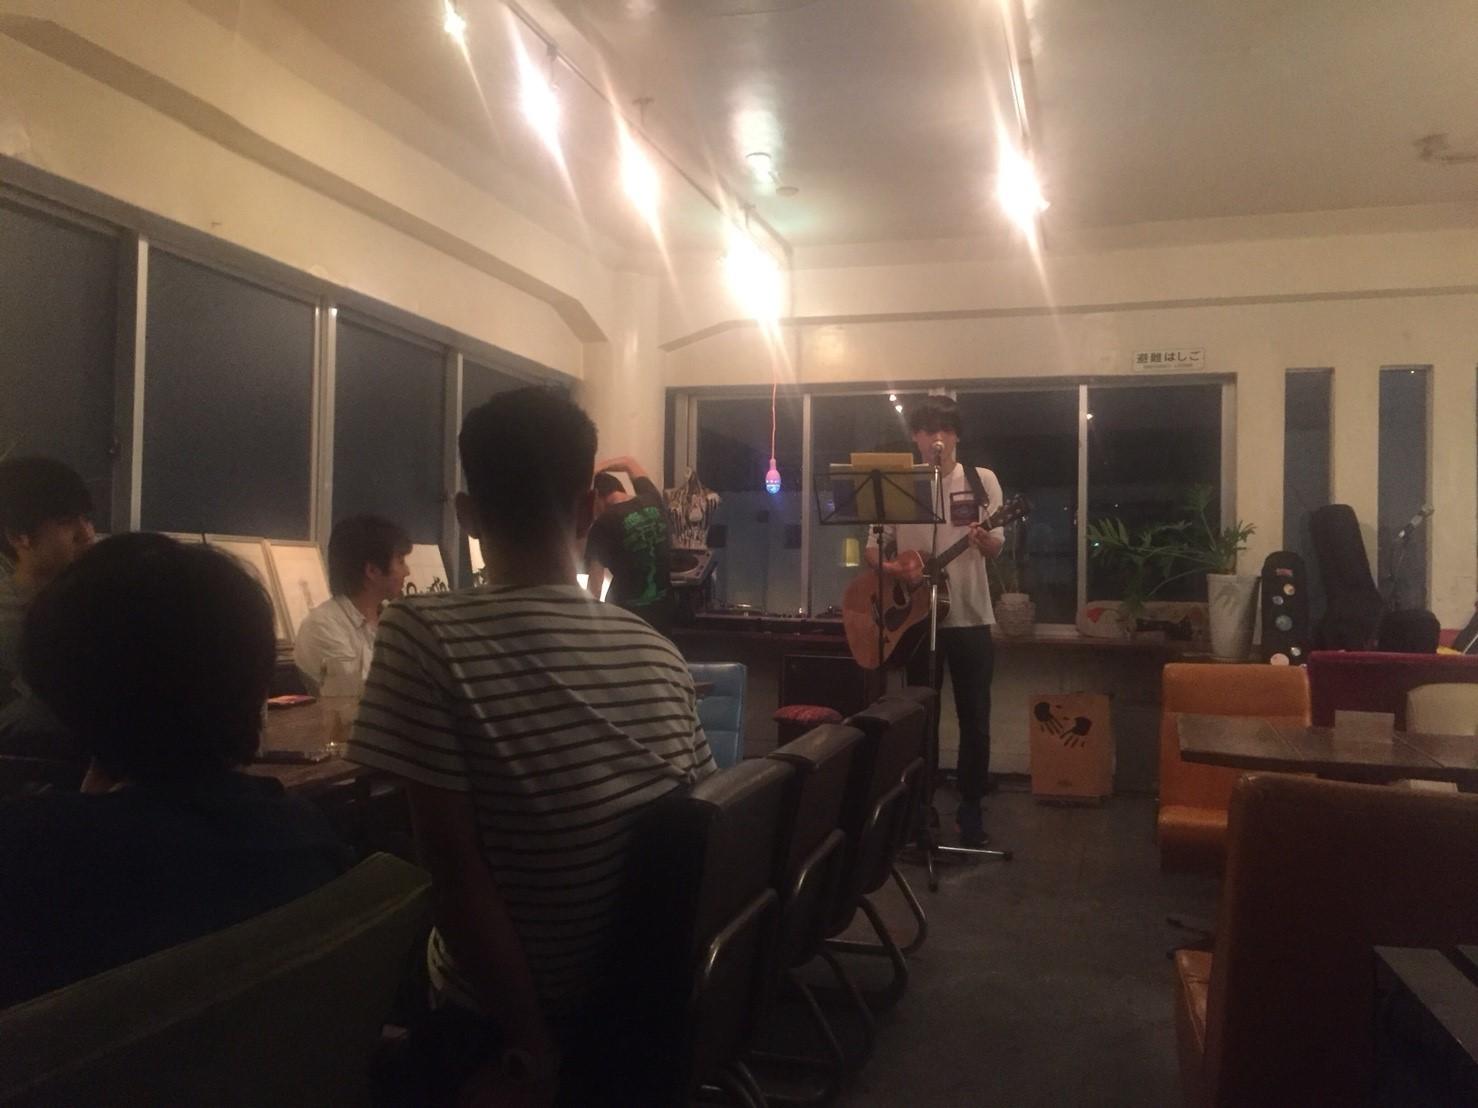 Luz × 鳥取大学 ACOUSTIC LIVE @Luzcafe  レポ_e0115904_13293576.jpg